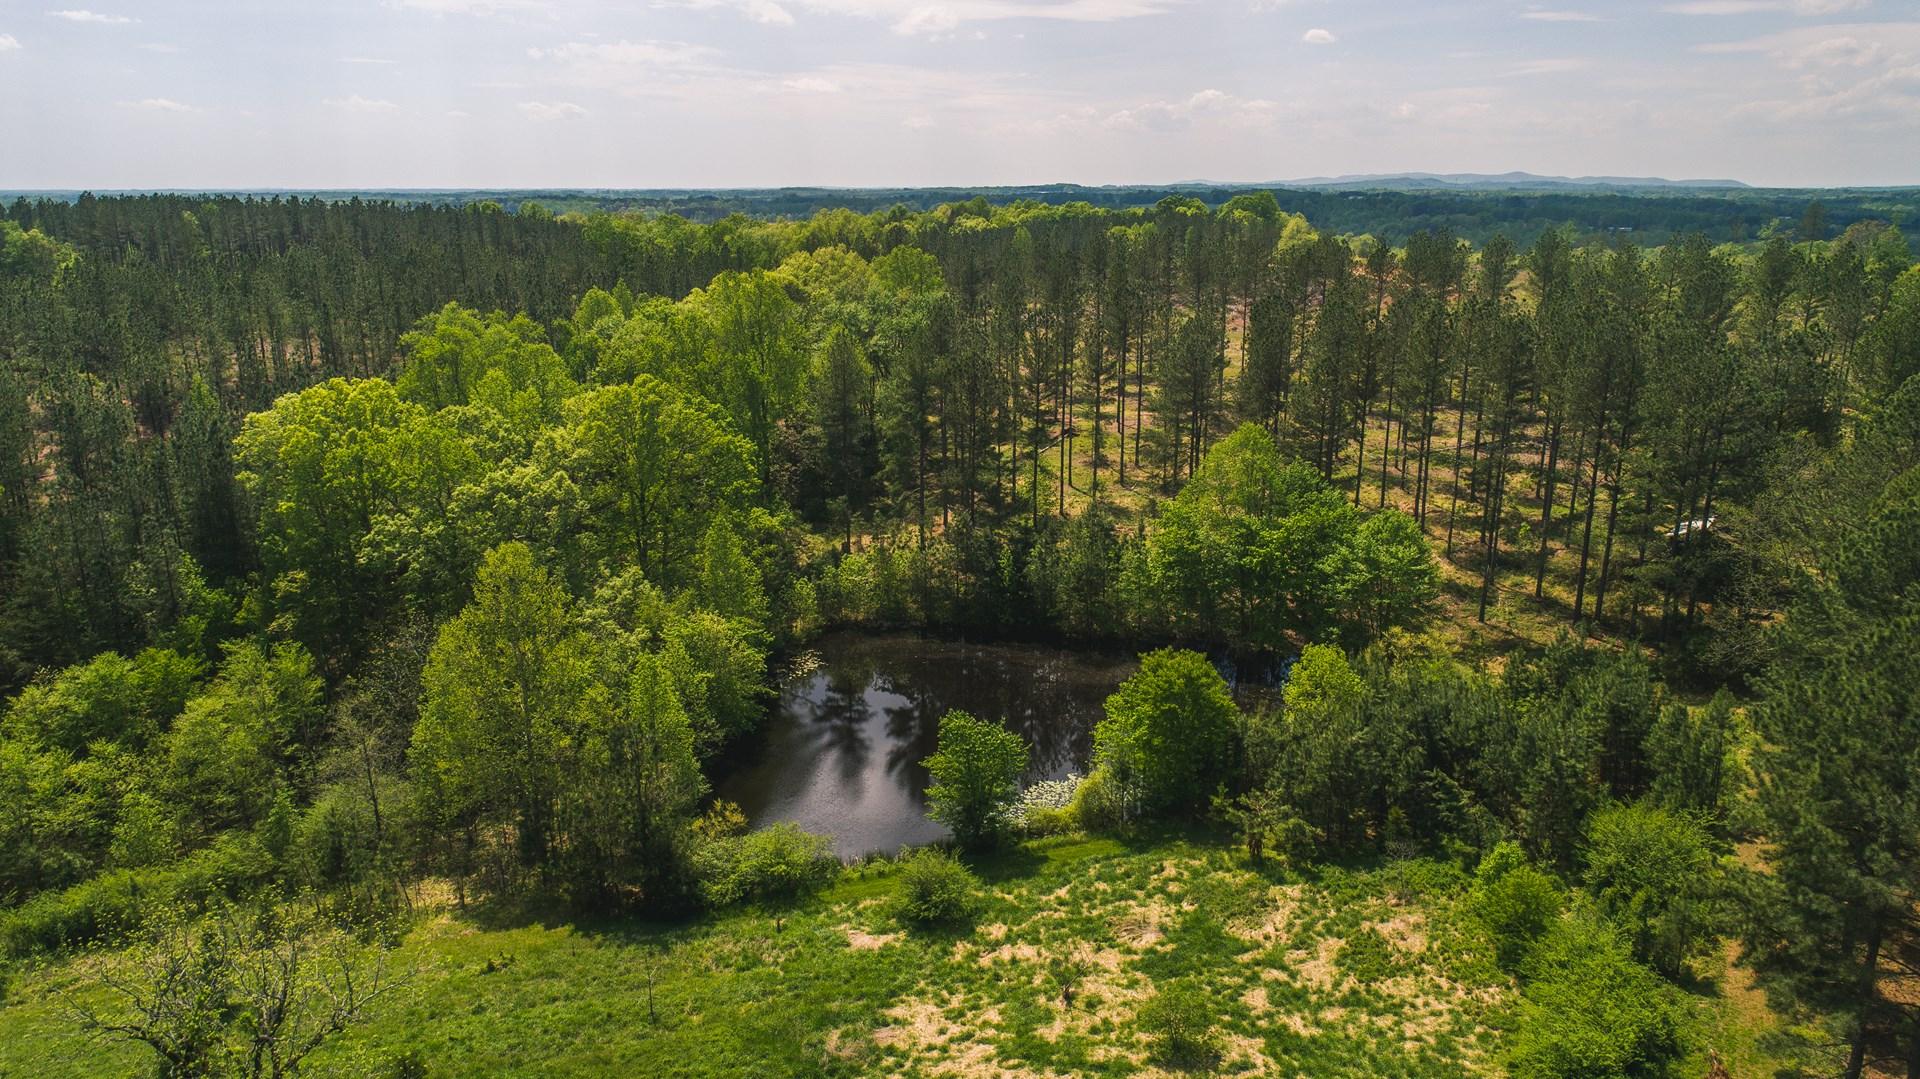 154 Acres In Chatham, VA: Pittsylvania County, VA